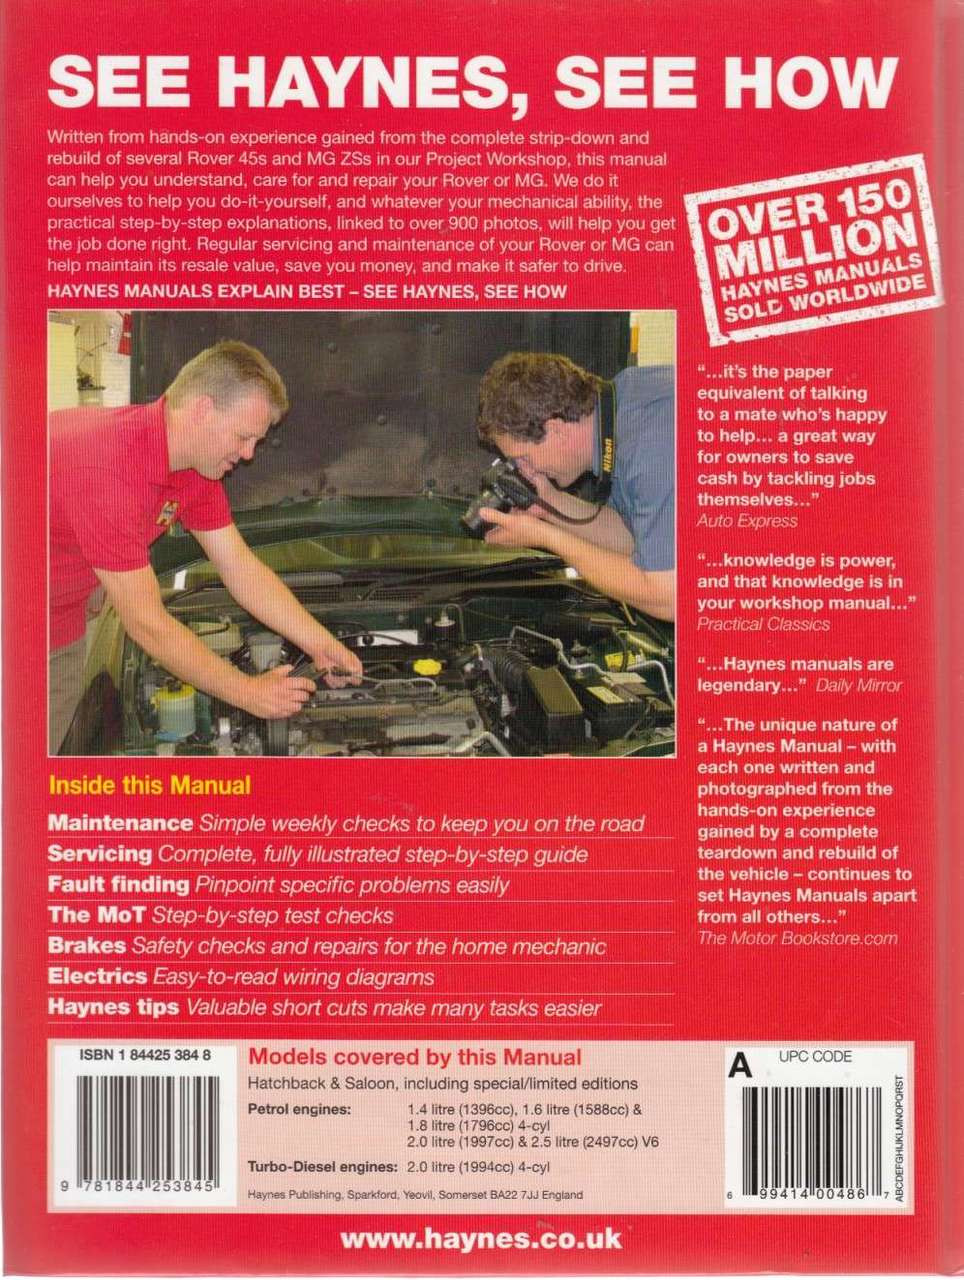 rover 45 & mg zs repair manual back cover